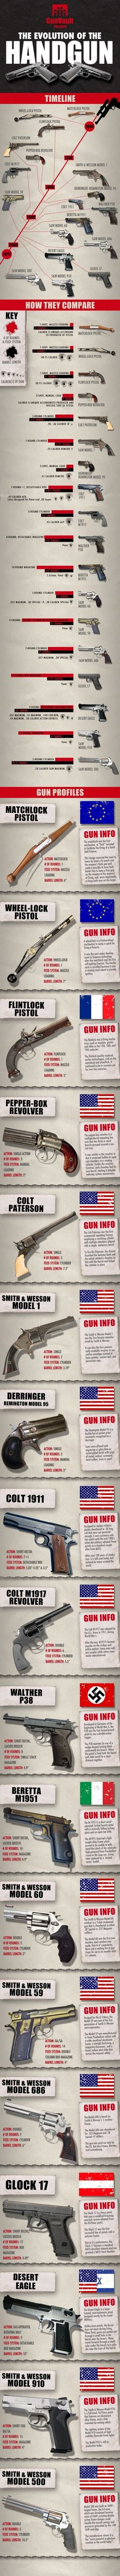 The Evolution of Handguns!  Check out www.hankeringforhistory.com for more!